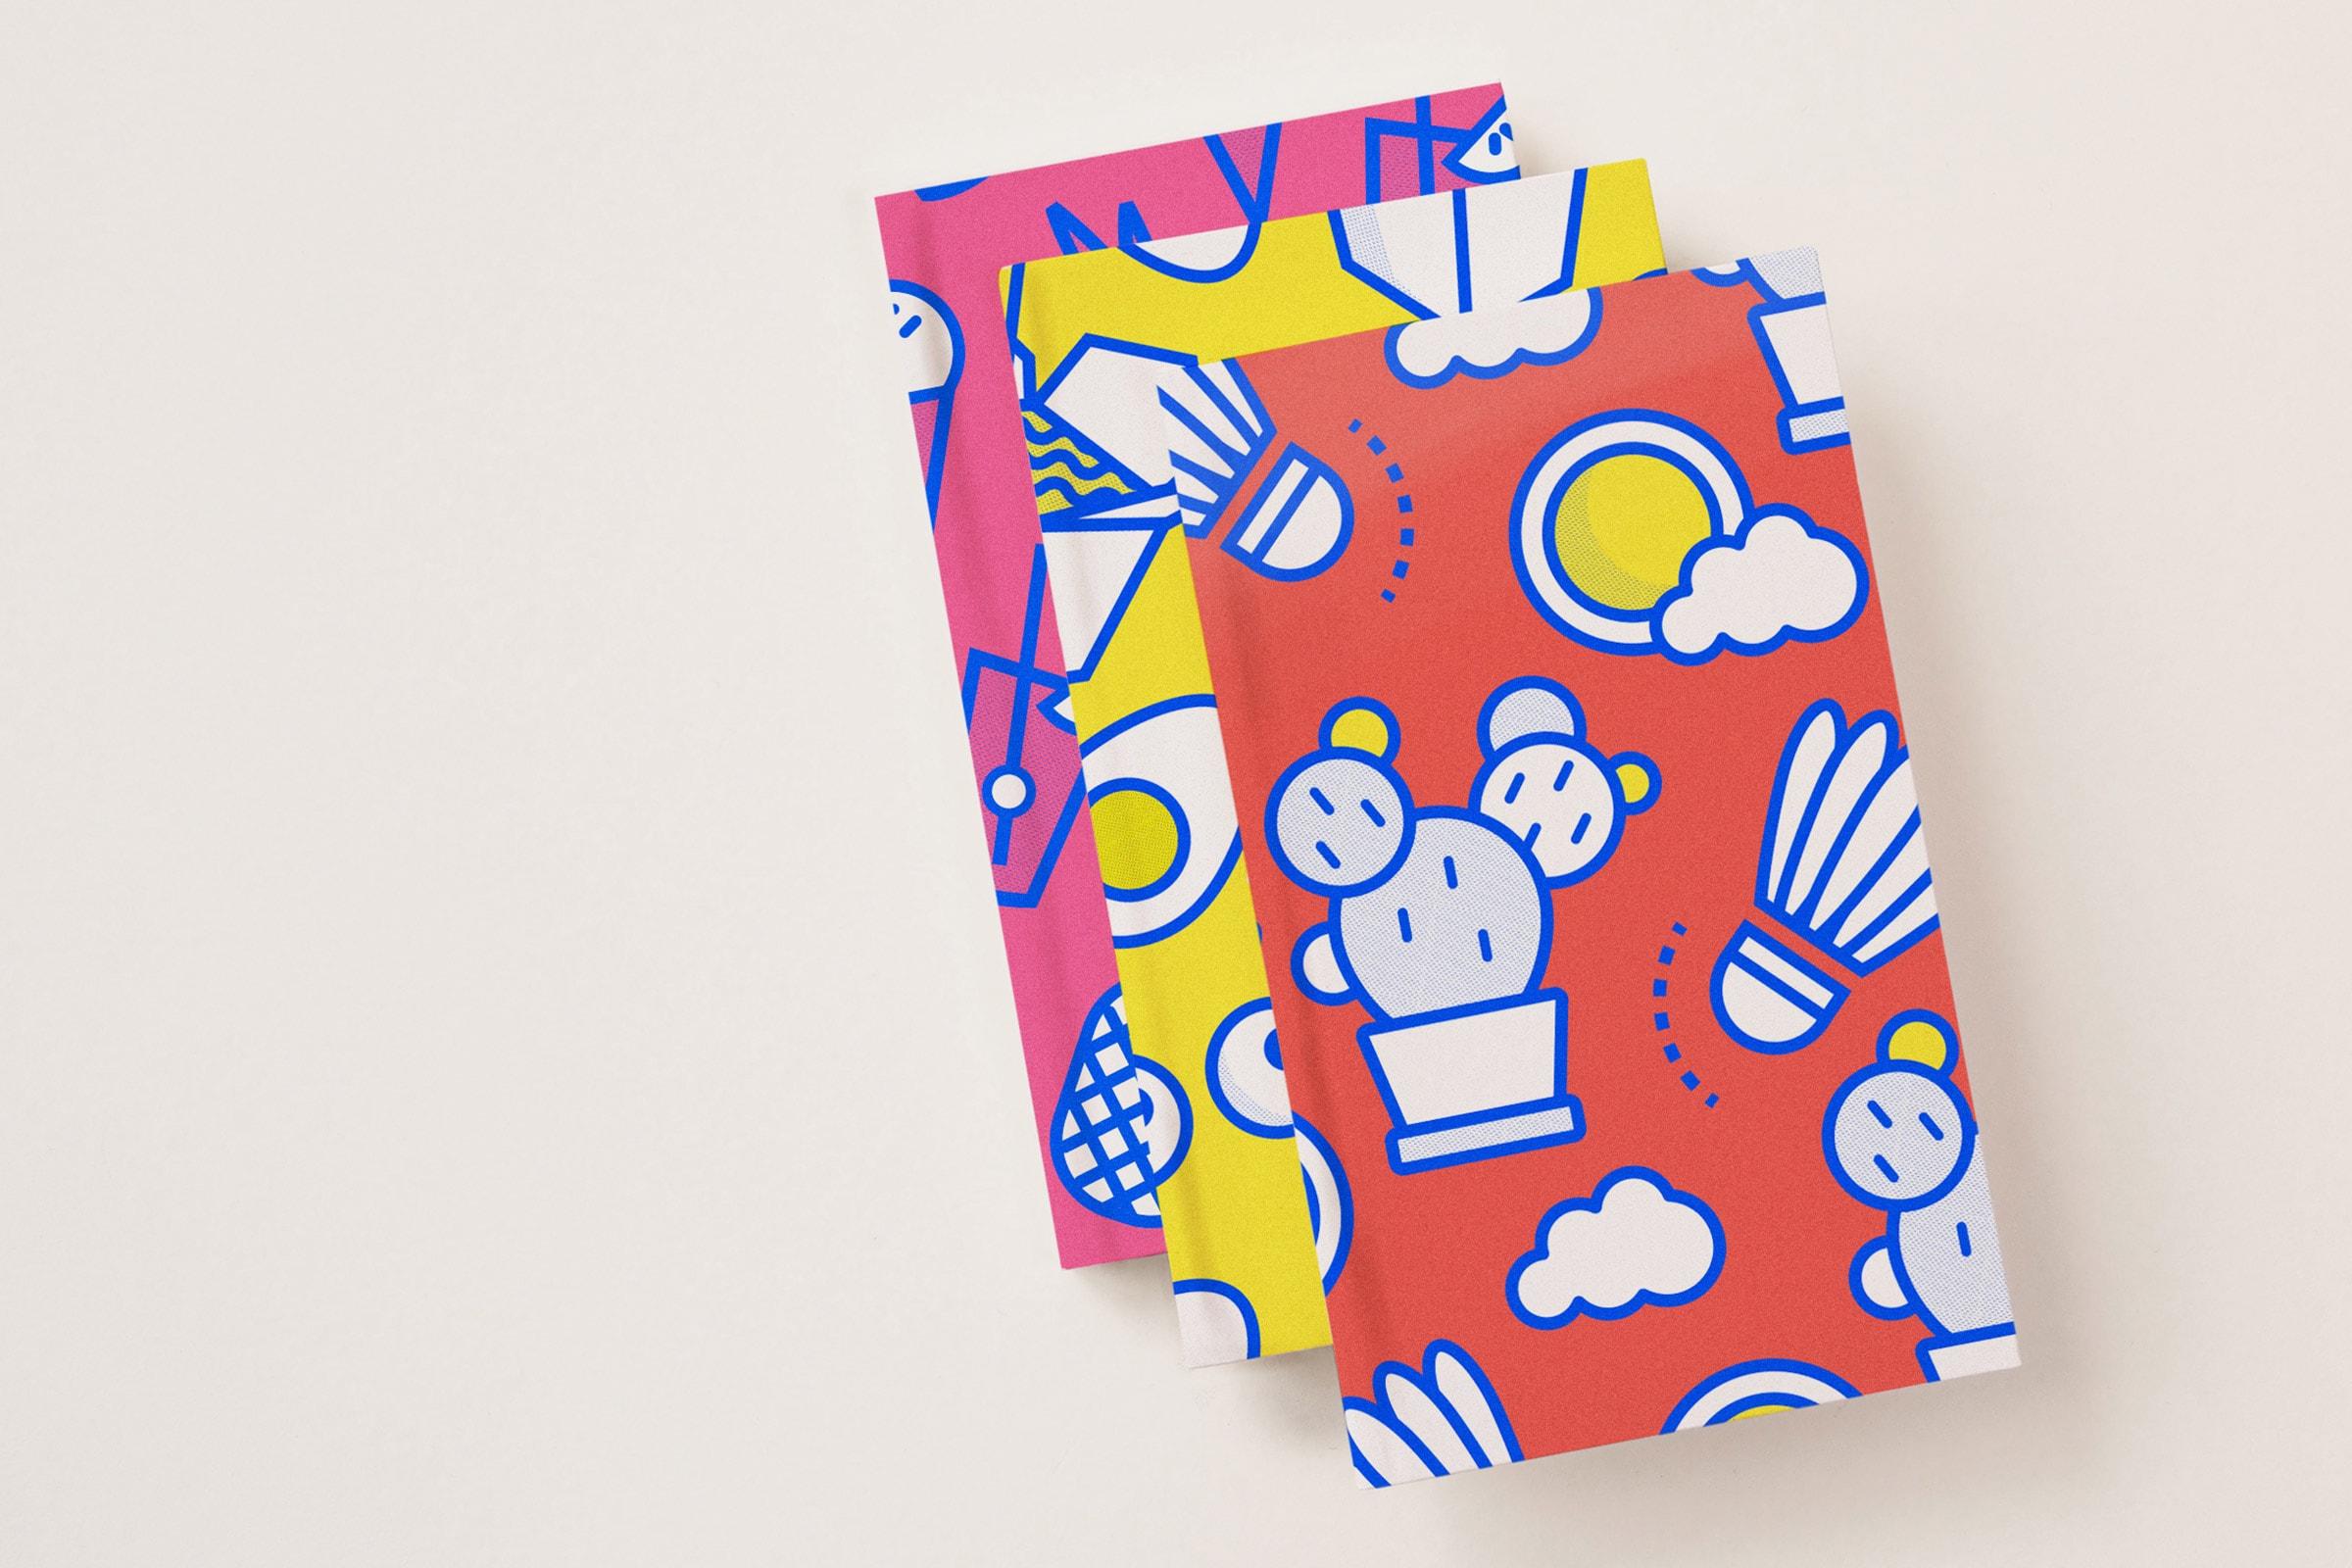 Notizbuch, KittoKatsu Playground, Illustration, Kaktus